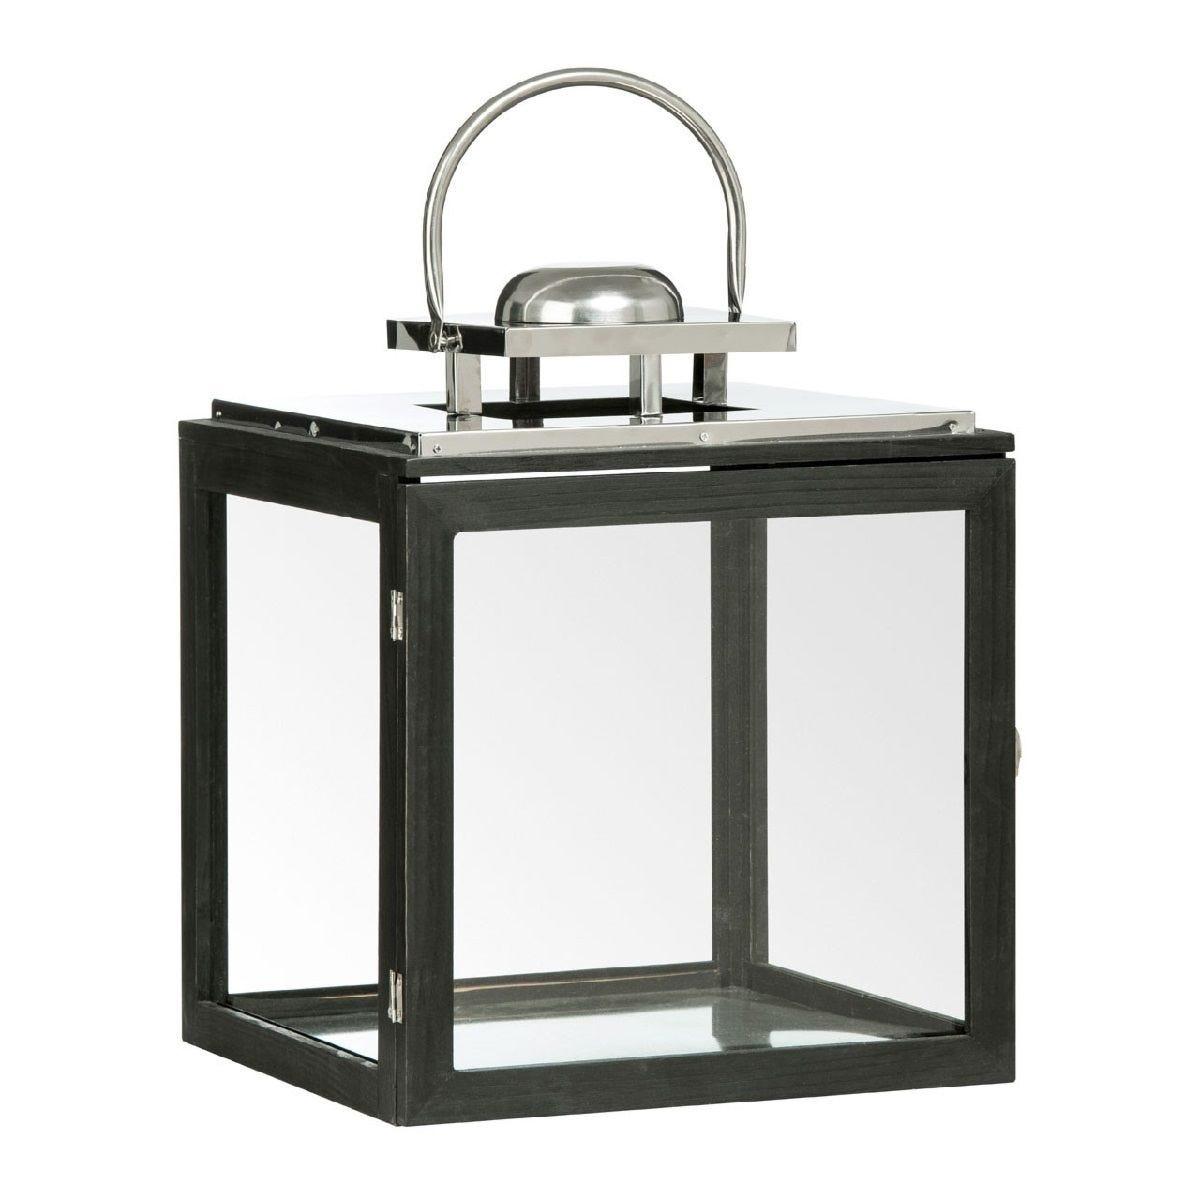 Premier Housewares Regents Park Large Lantern - Black Wood/Stainless Steel